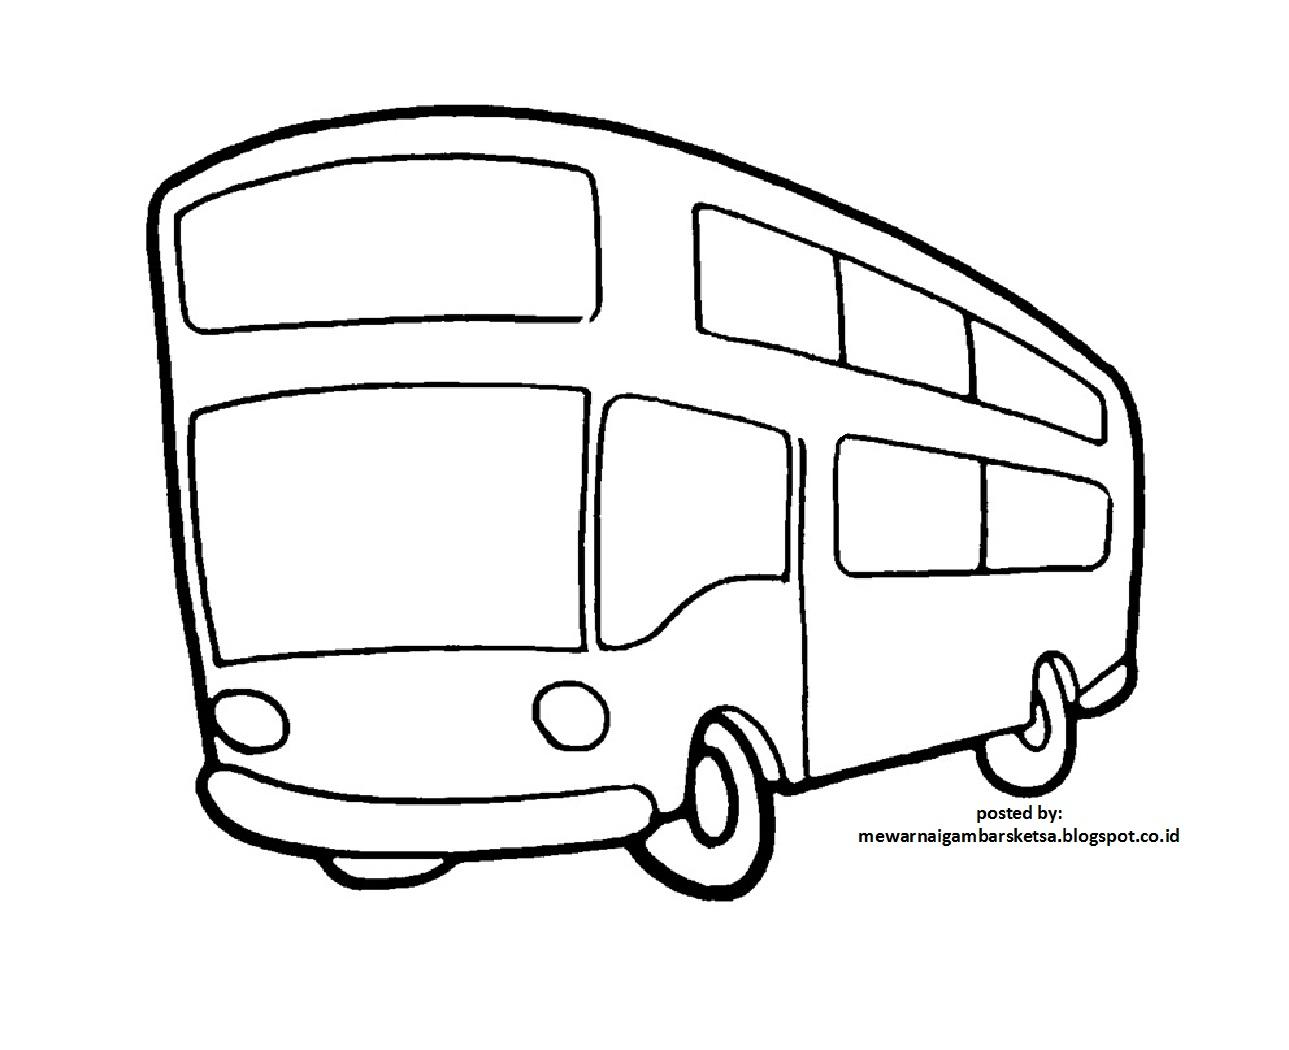 Kumpulan Sketsa Gambar Transportasi